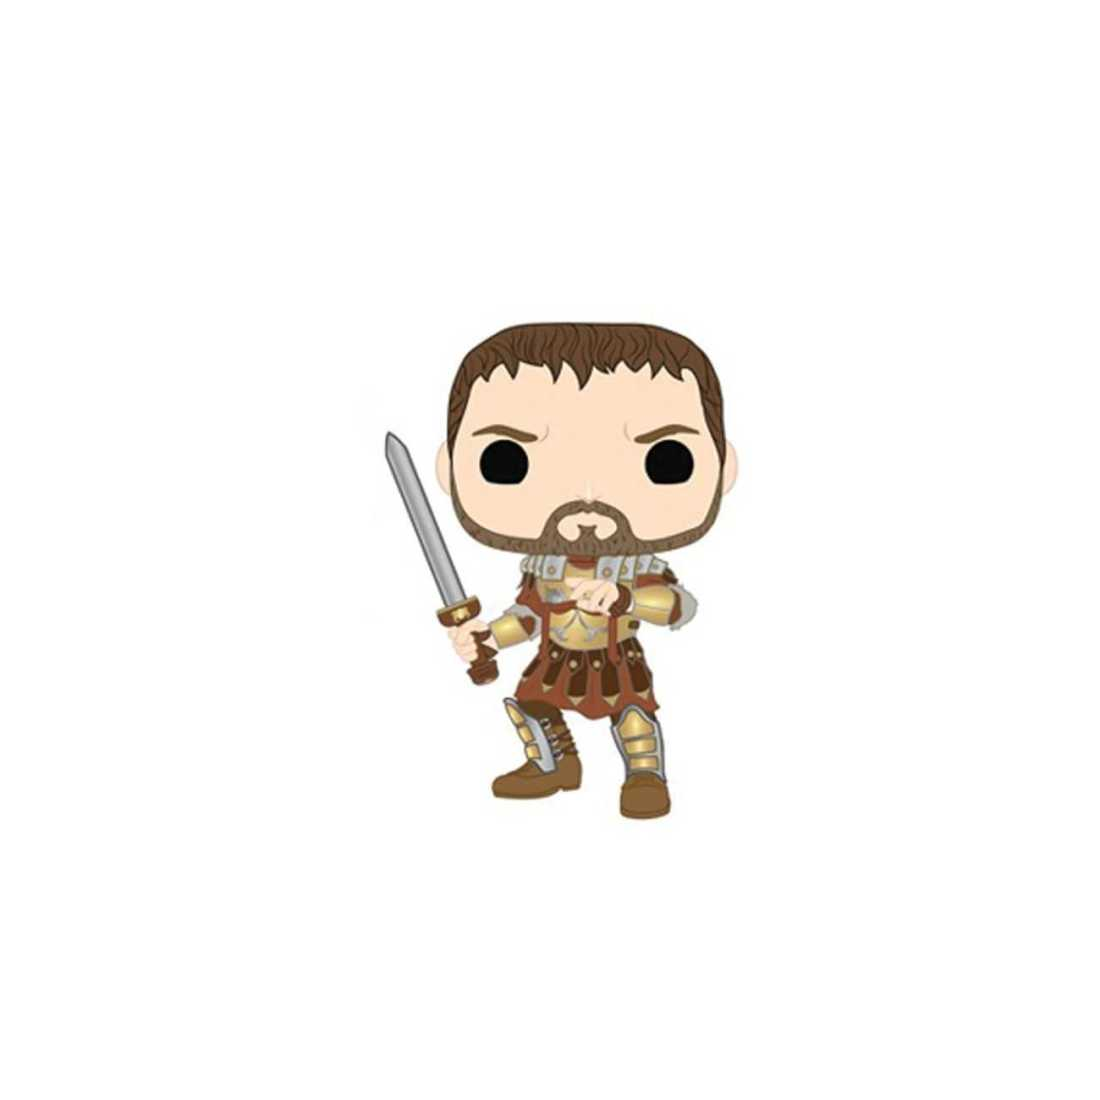 40817_POPMovies_Gladiator_Maximus2_NotFinal_webEDIT.jpg